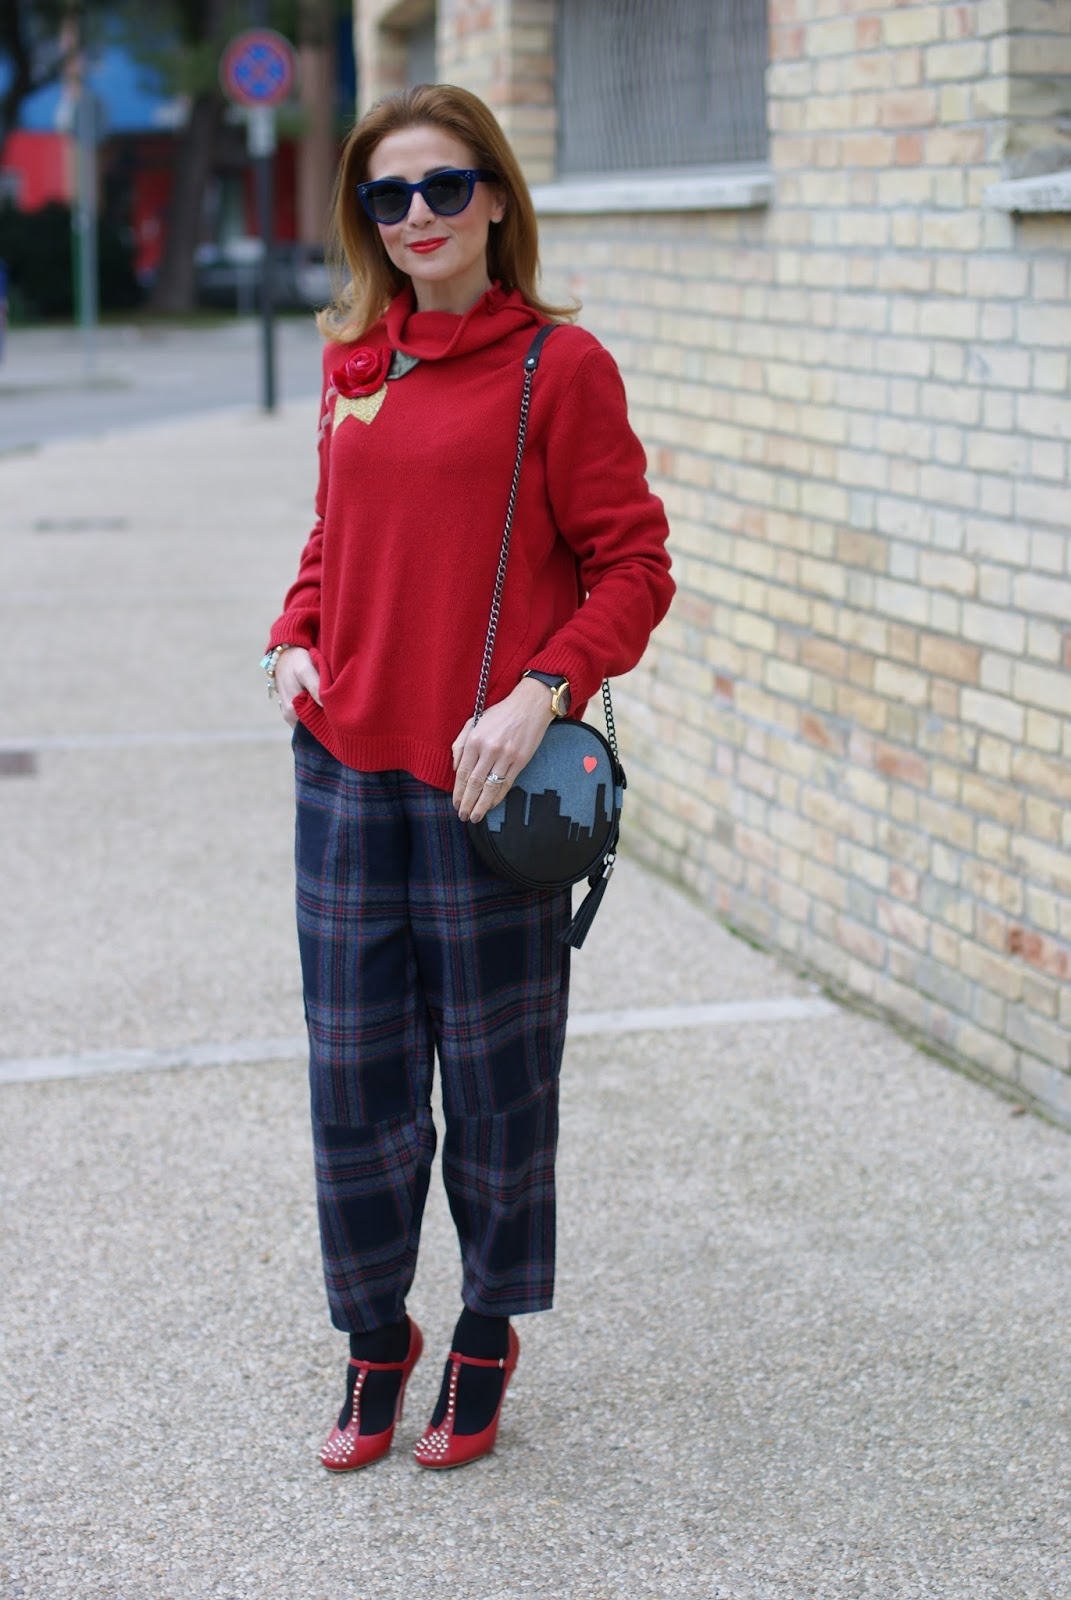 Choies Plaid pants, Rosè a Pois sweater and Miu Miu Mary Jane pumps on Fashion and Cookies fashion blog, fashion blogger style